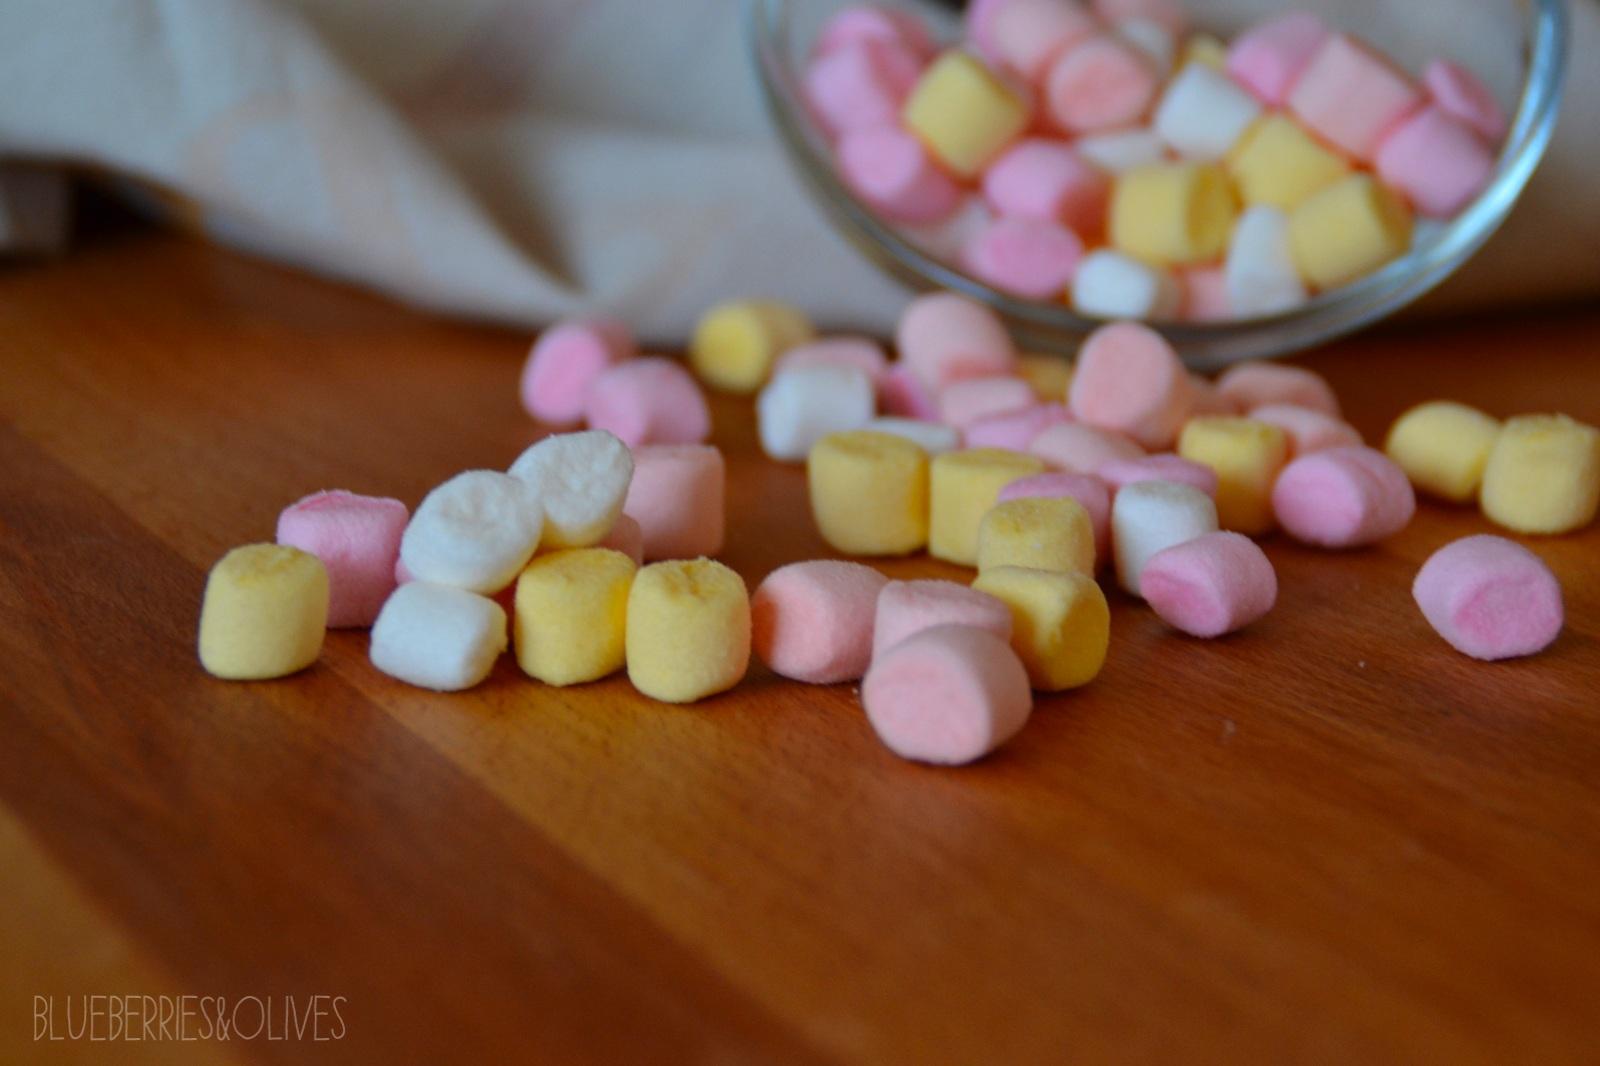 Nubes de caramelo Chocolate caliente especiado 7